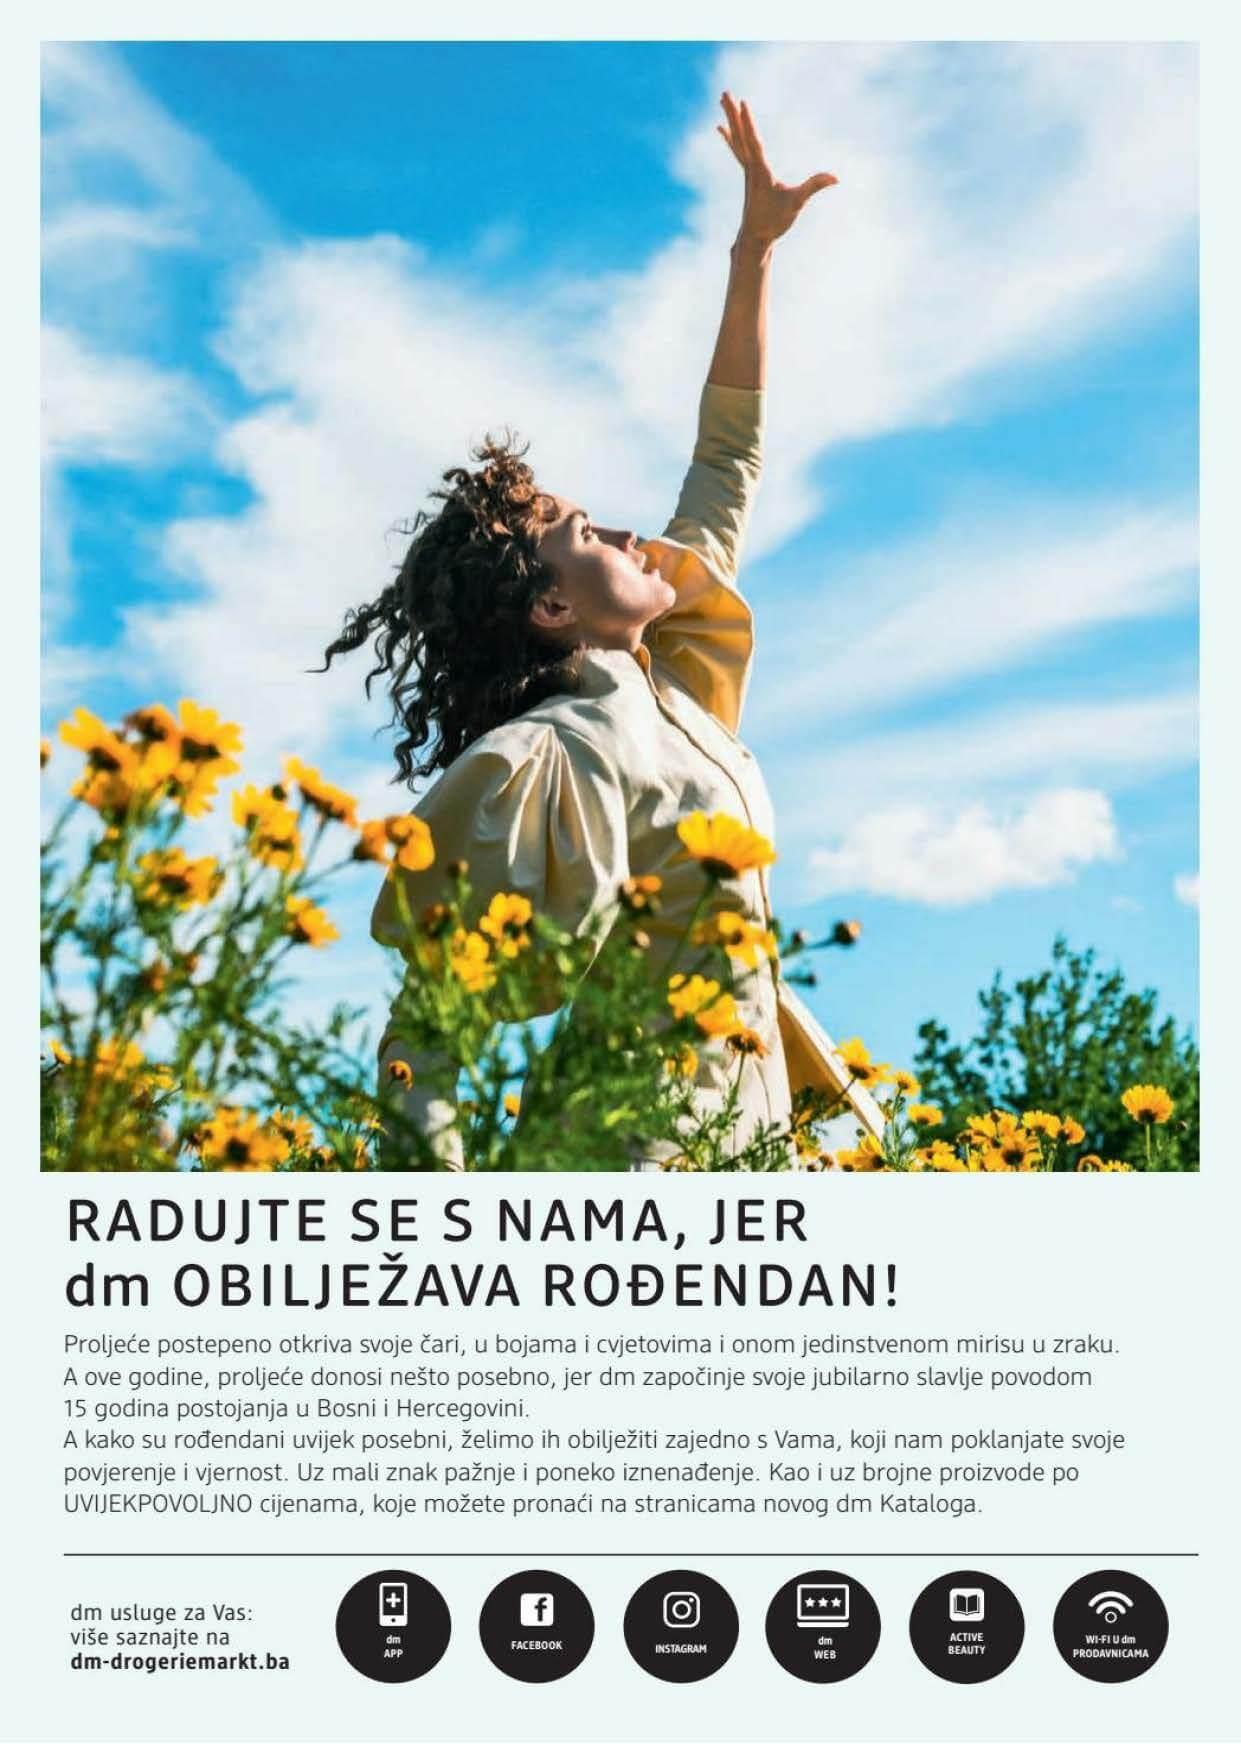 DM Katalog BiH APRIL MAJ 2021 28.04.2021. 11.05.2021. Page 02